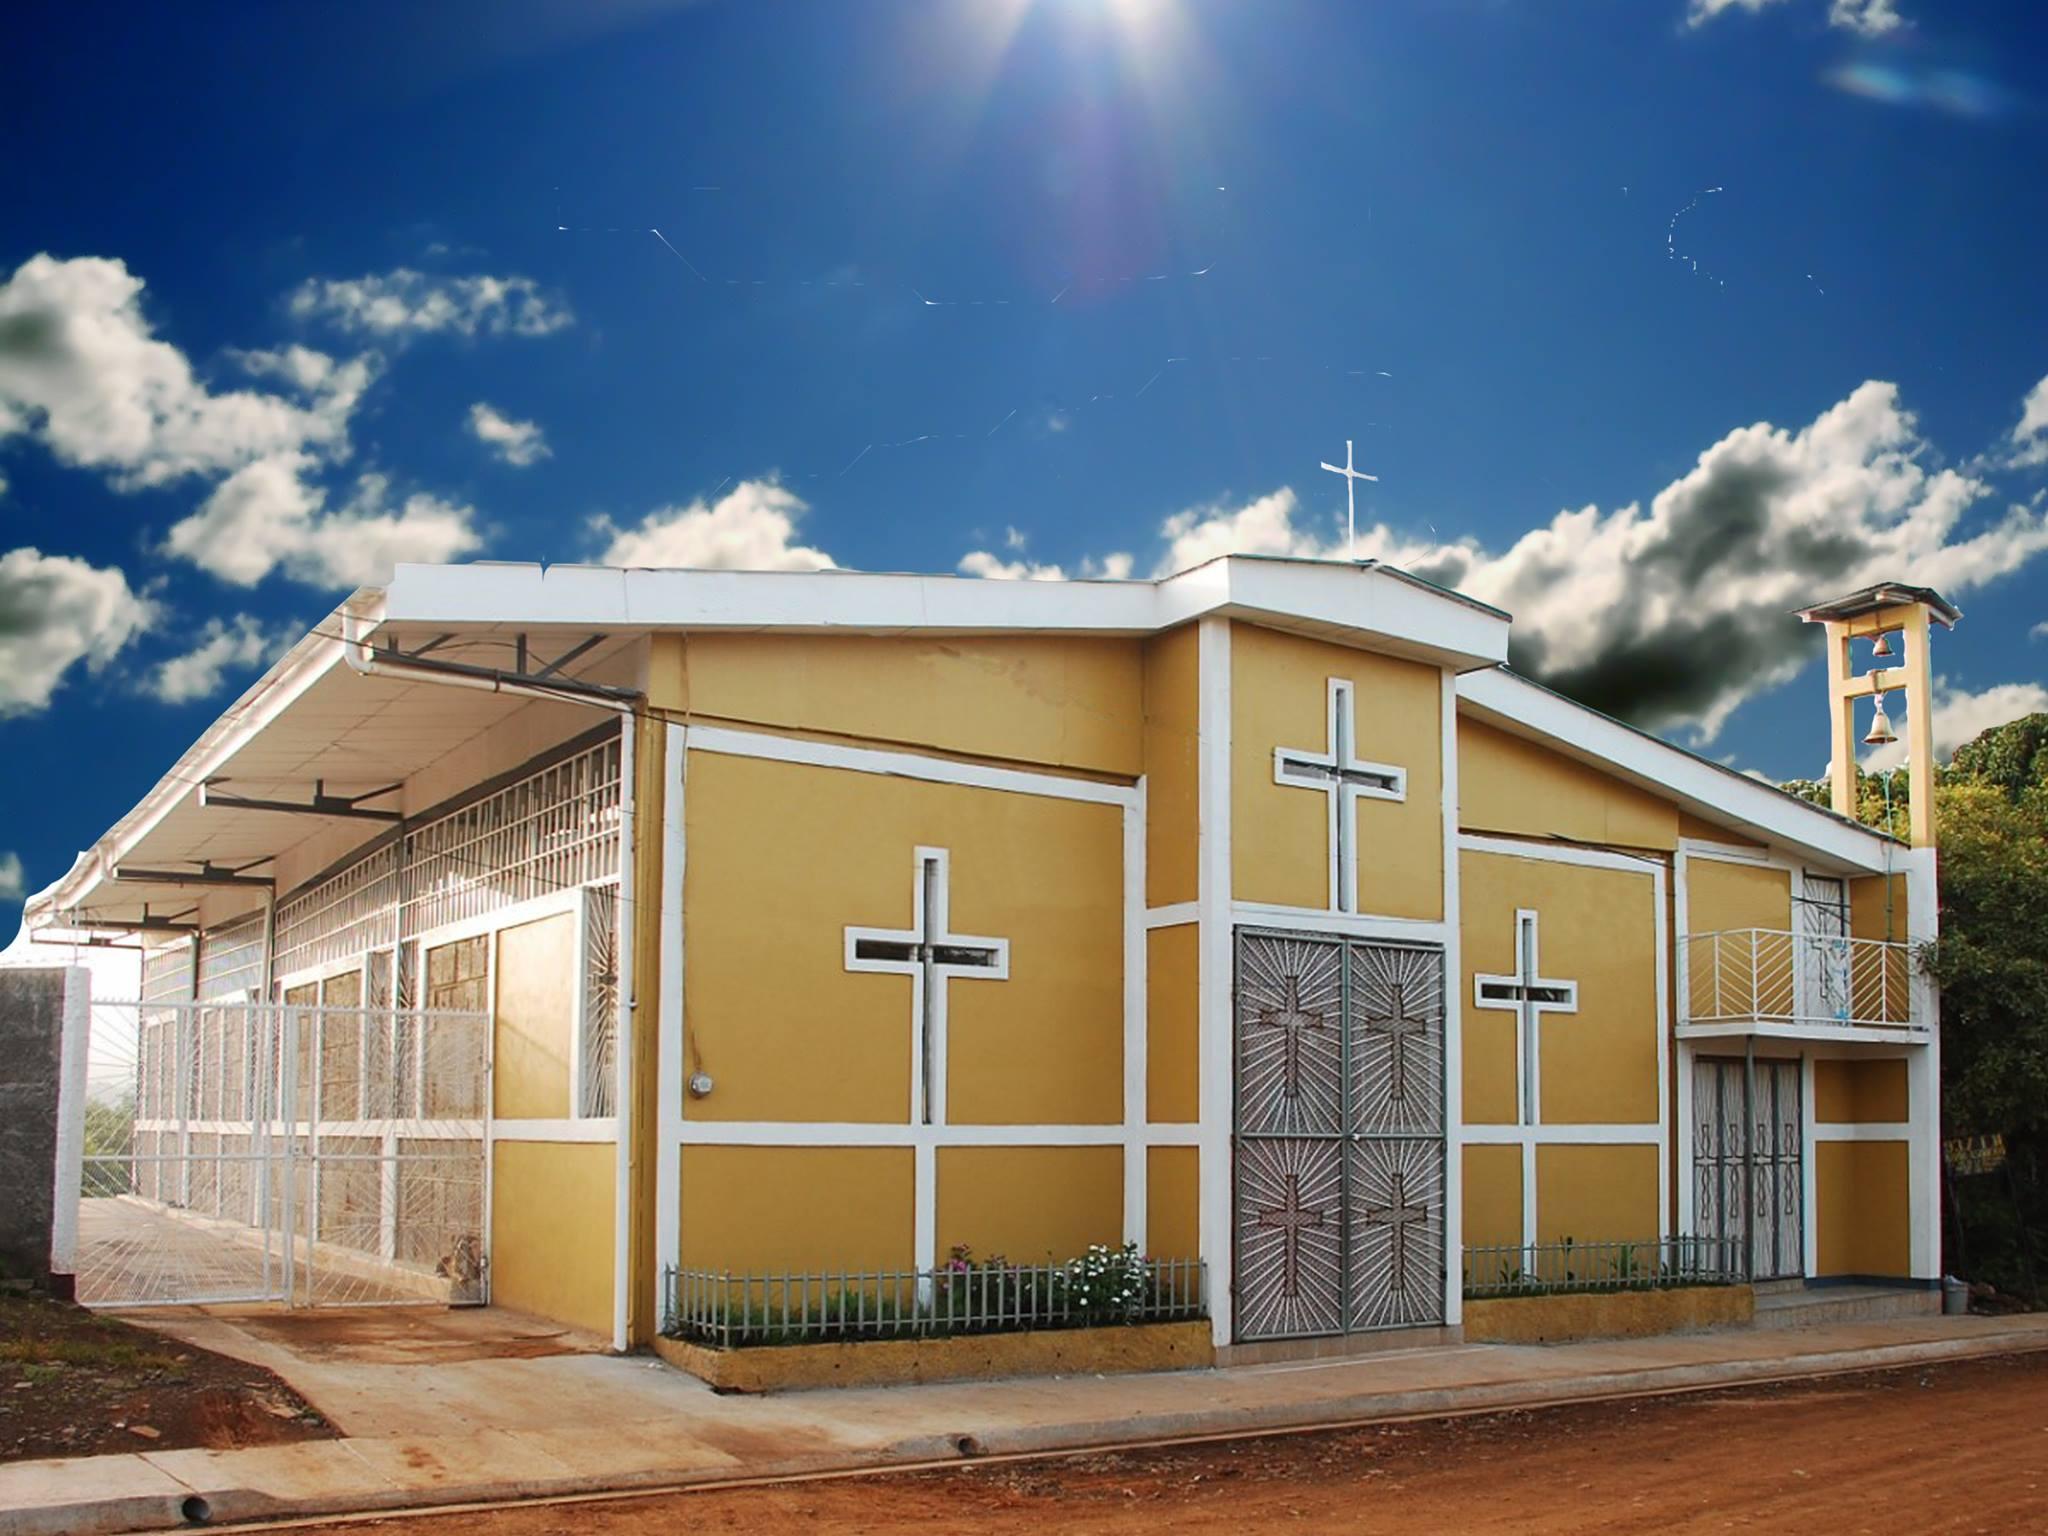 Sal n parroquial en la parroquia divino ni o en juigalpa for Oficina 2038 bankia